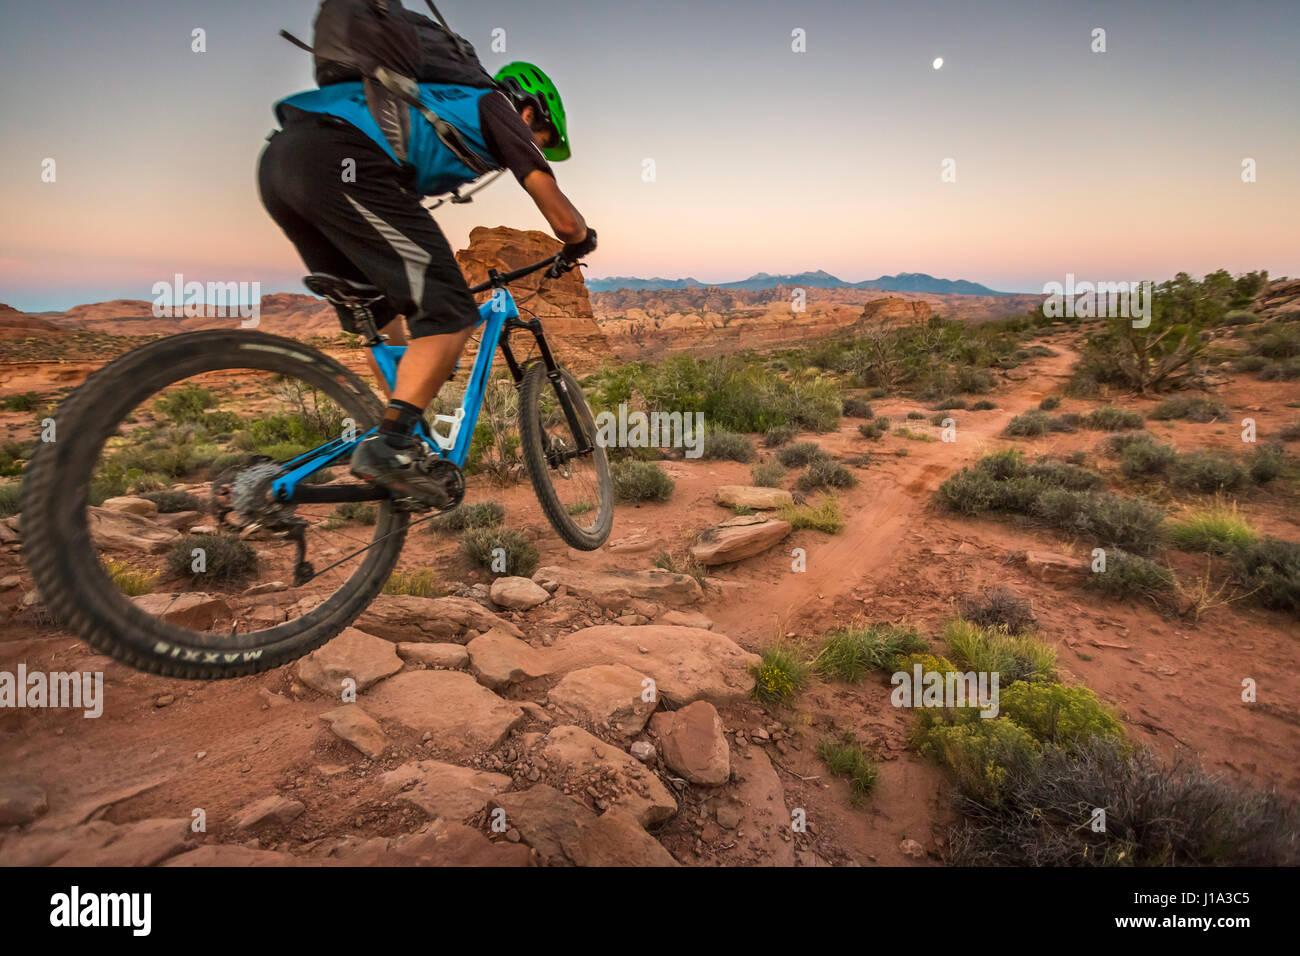 Tyson Swasey mountian Bike auf der Hymasa Trail, Moab, Utah. Stockbild